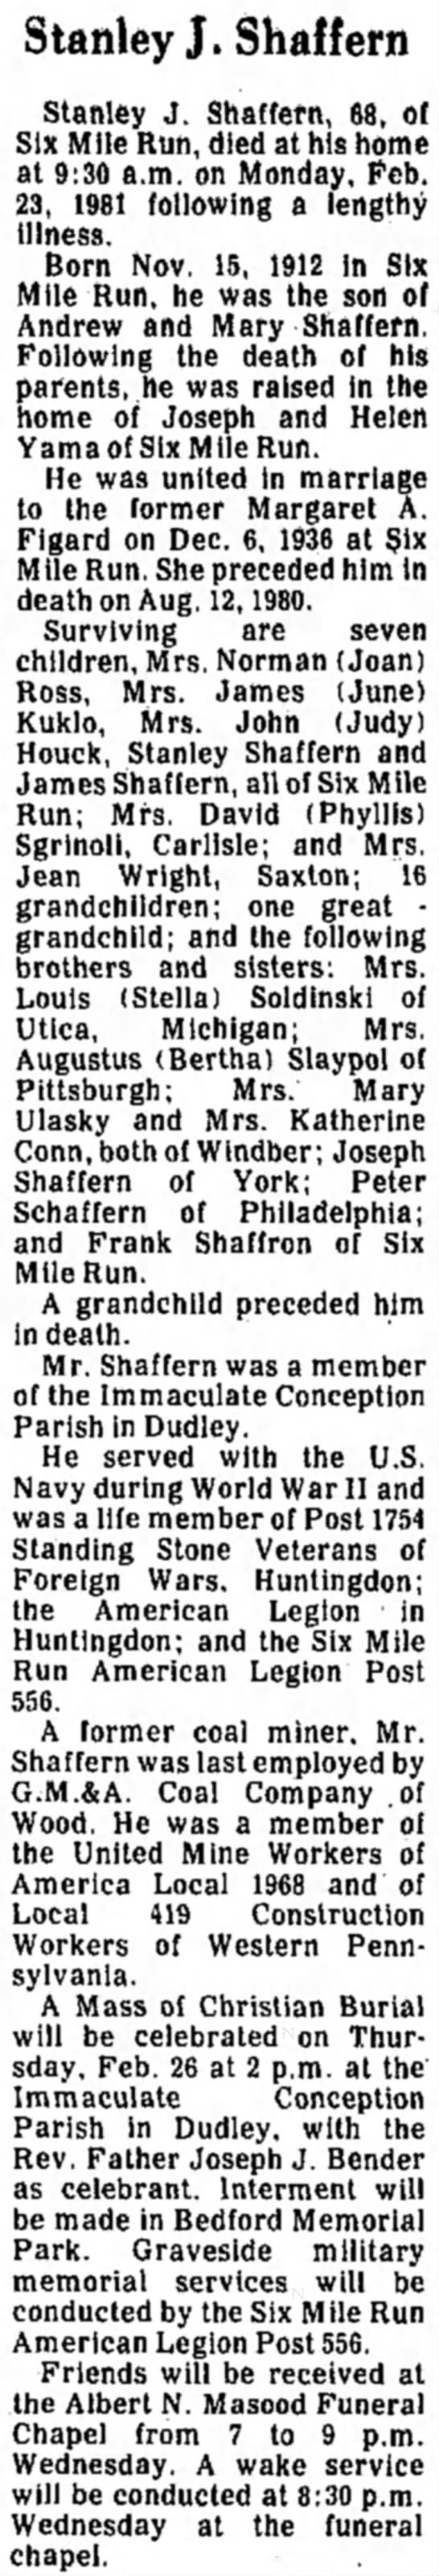 Stanley James Shaffern - J, Shaffern Stanley J. Shaffern, 68, of Six...